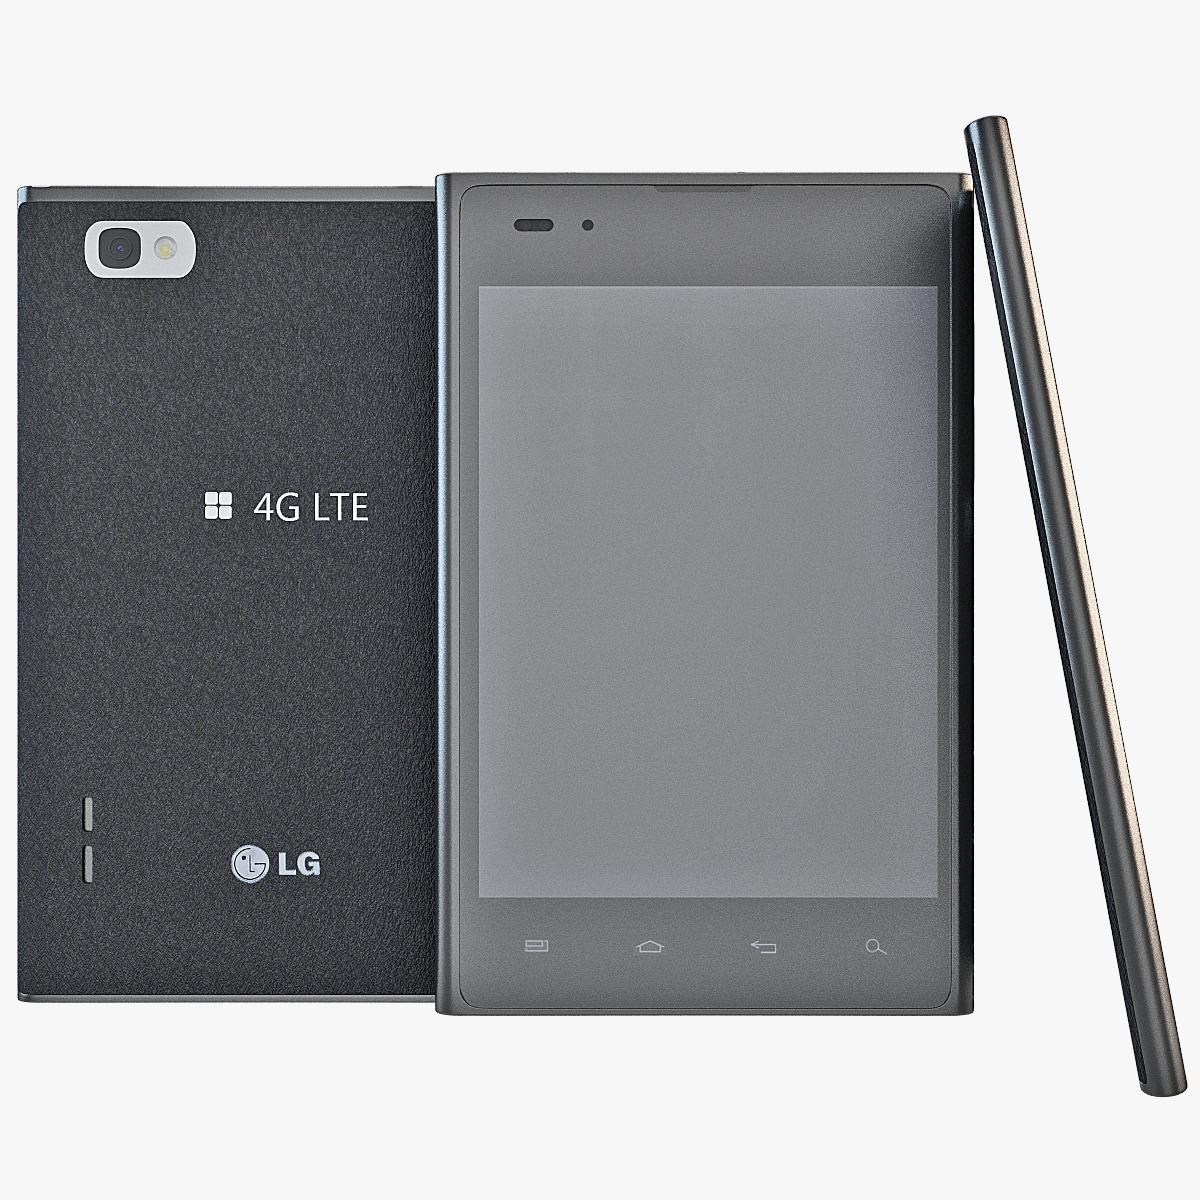 LG_Optimus_Vu_000.jpg